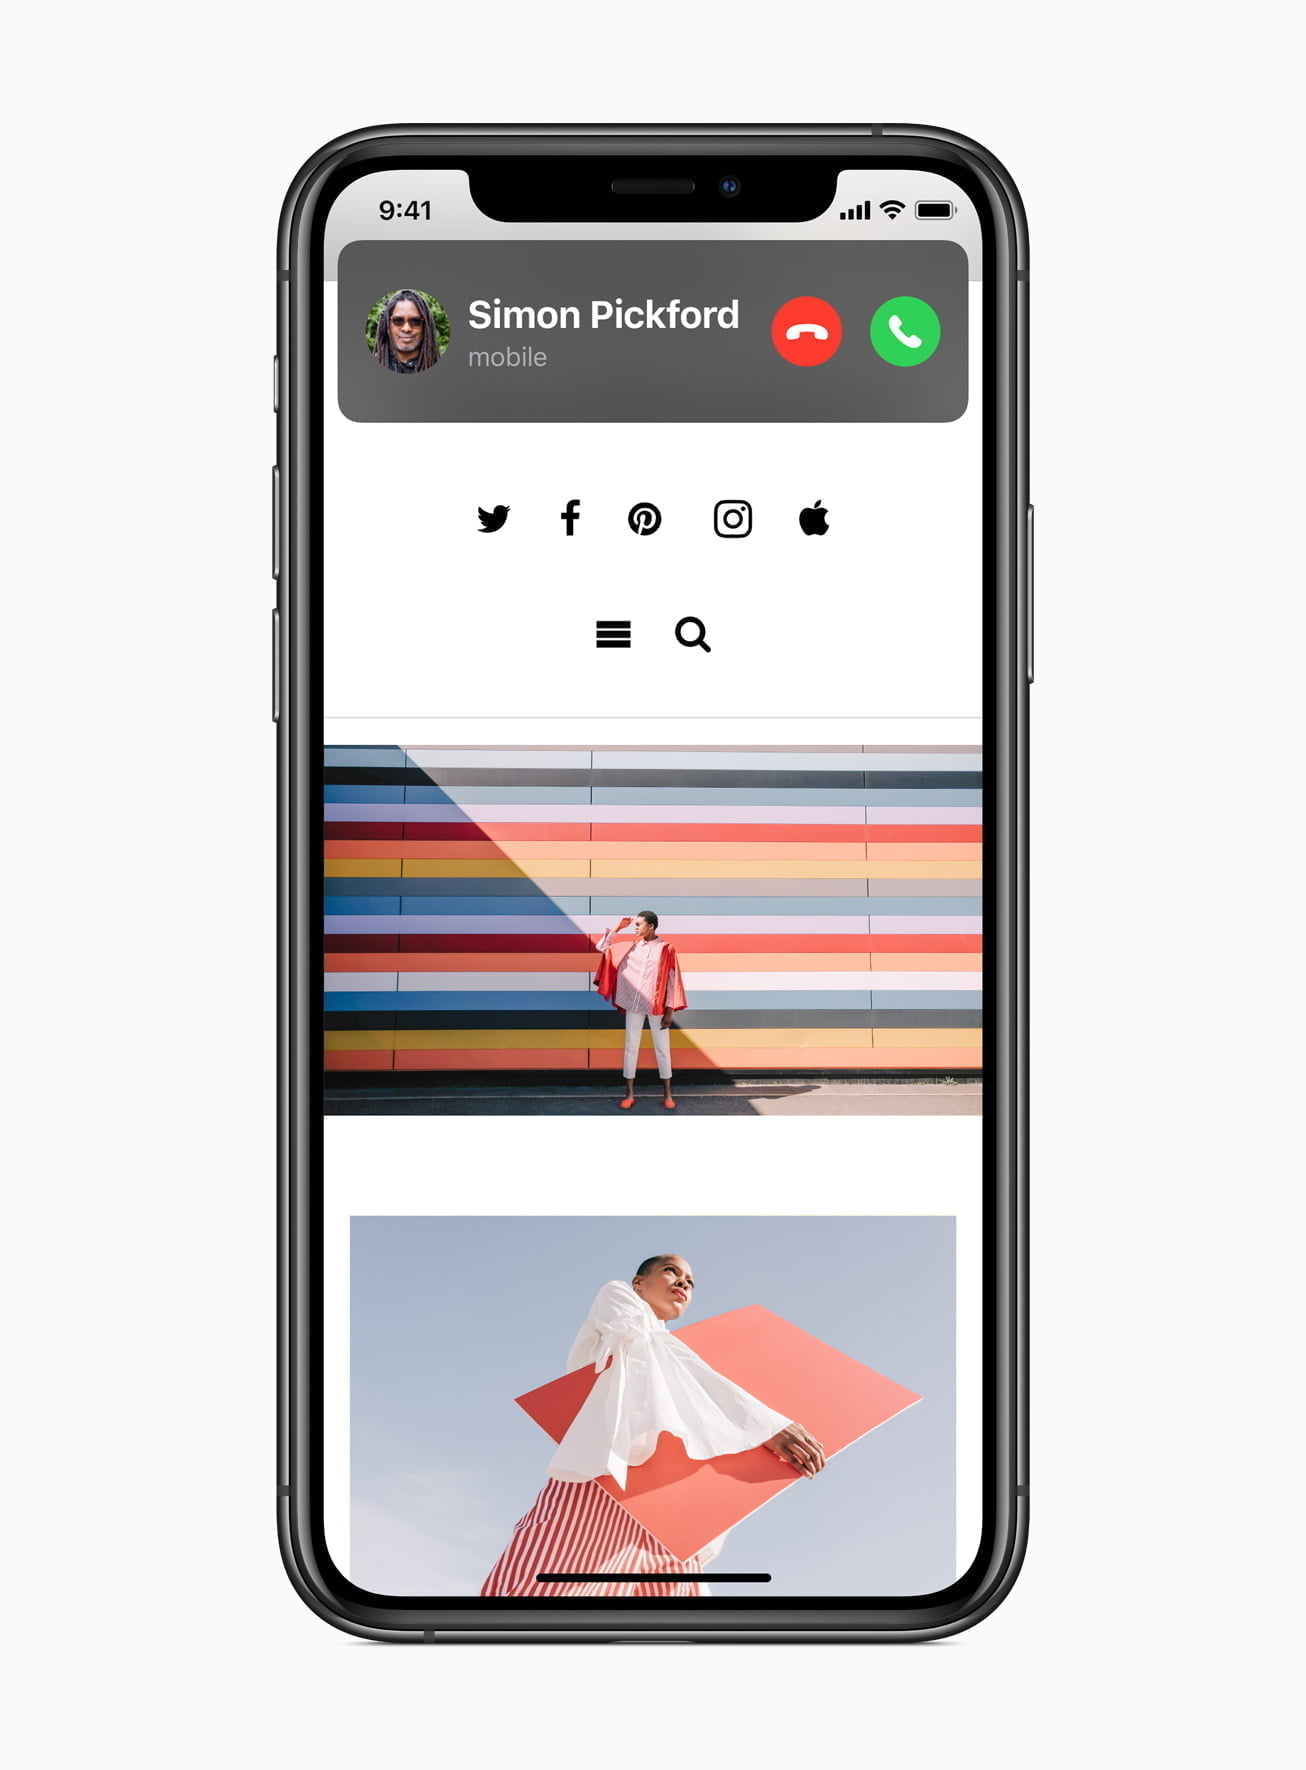 Apple ios14 incoming call